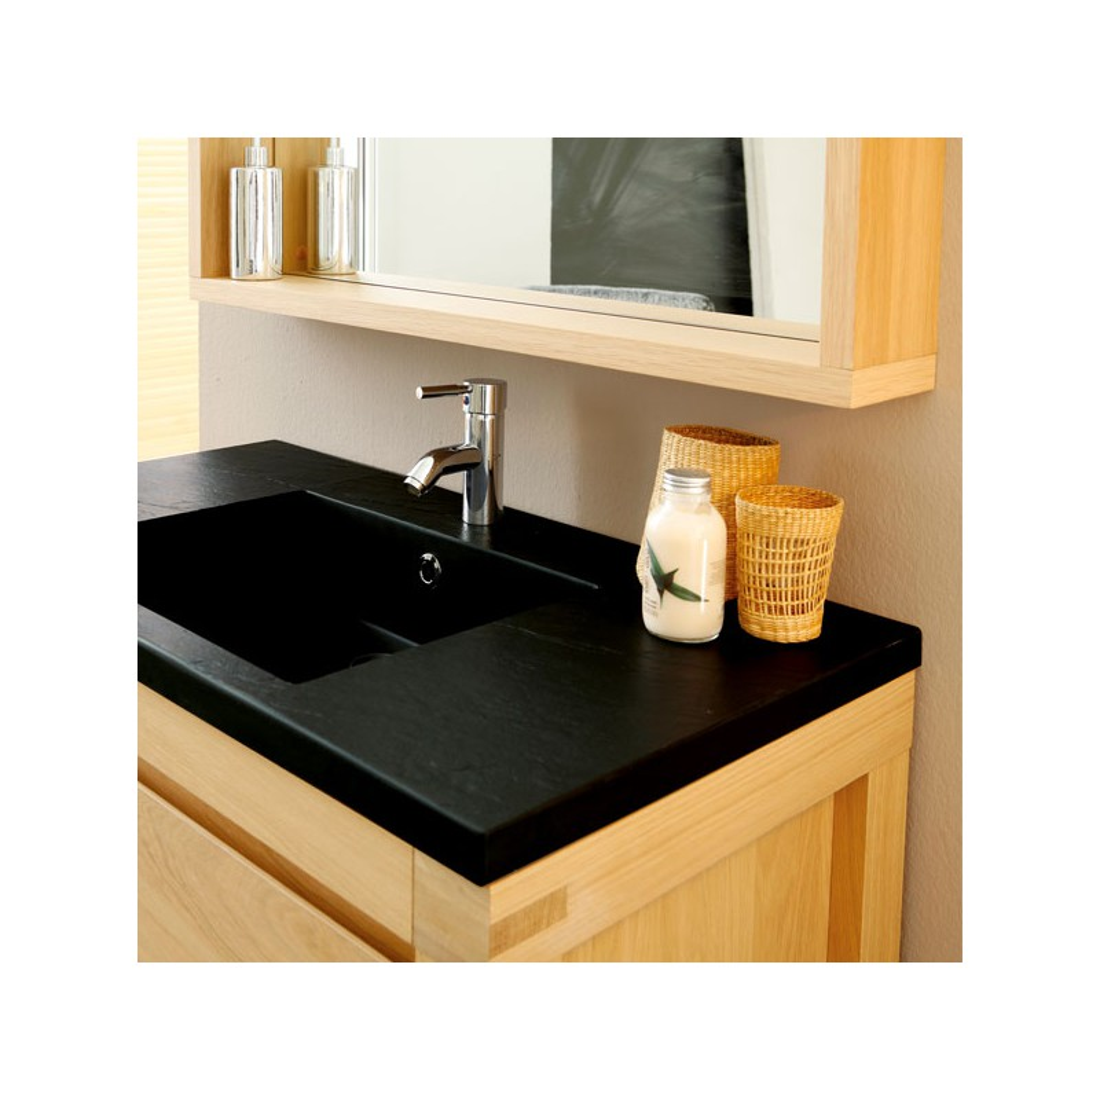 Ensemble salle de bain bois meuble de salle bain une for Meuble artemis